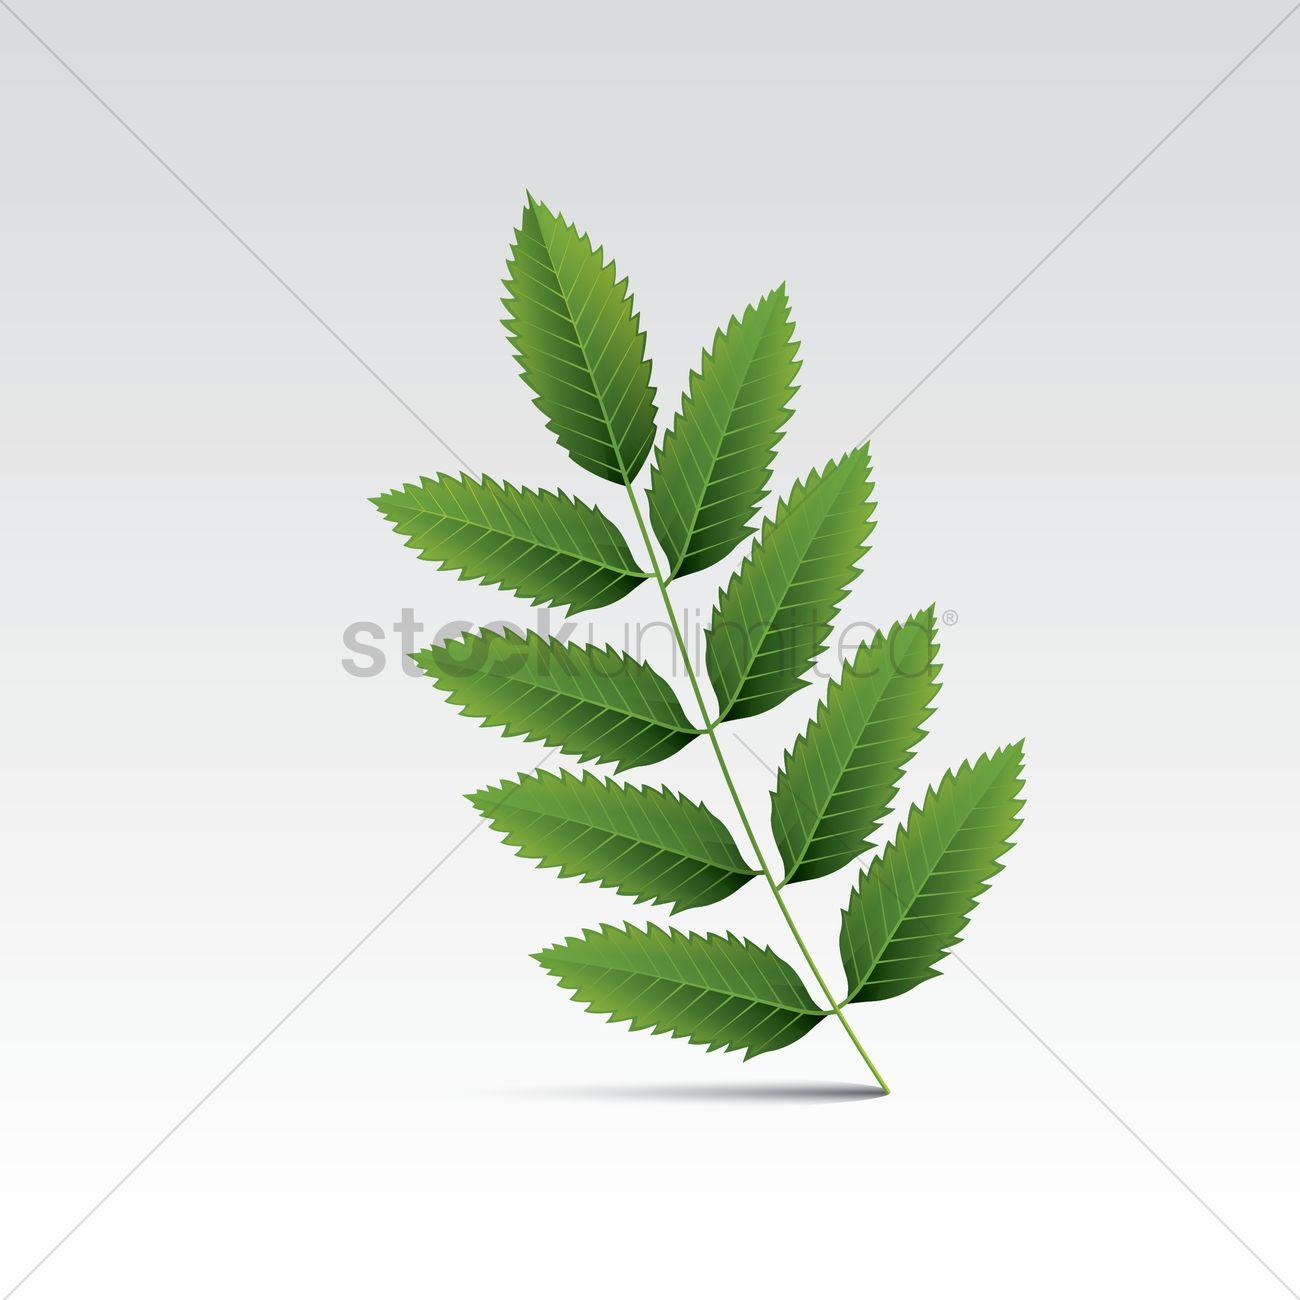 Sumac leaf Vector Image.